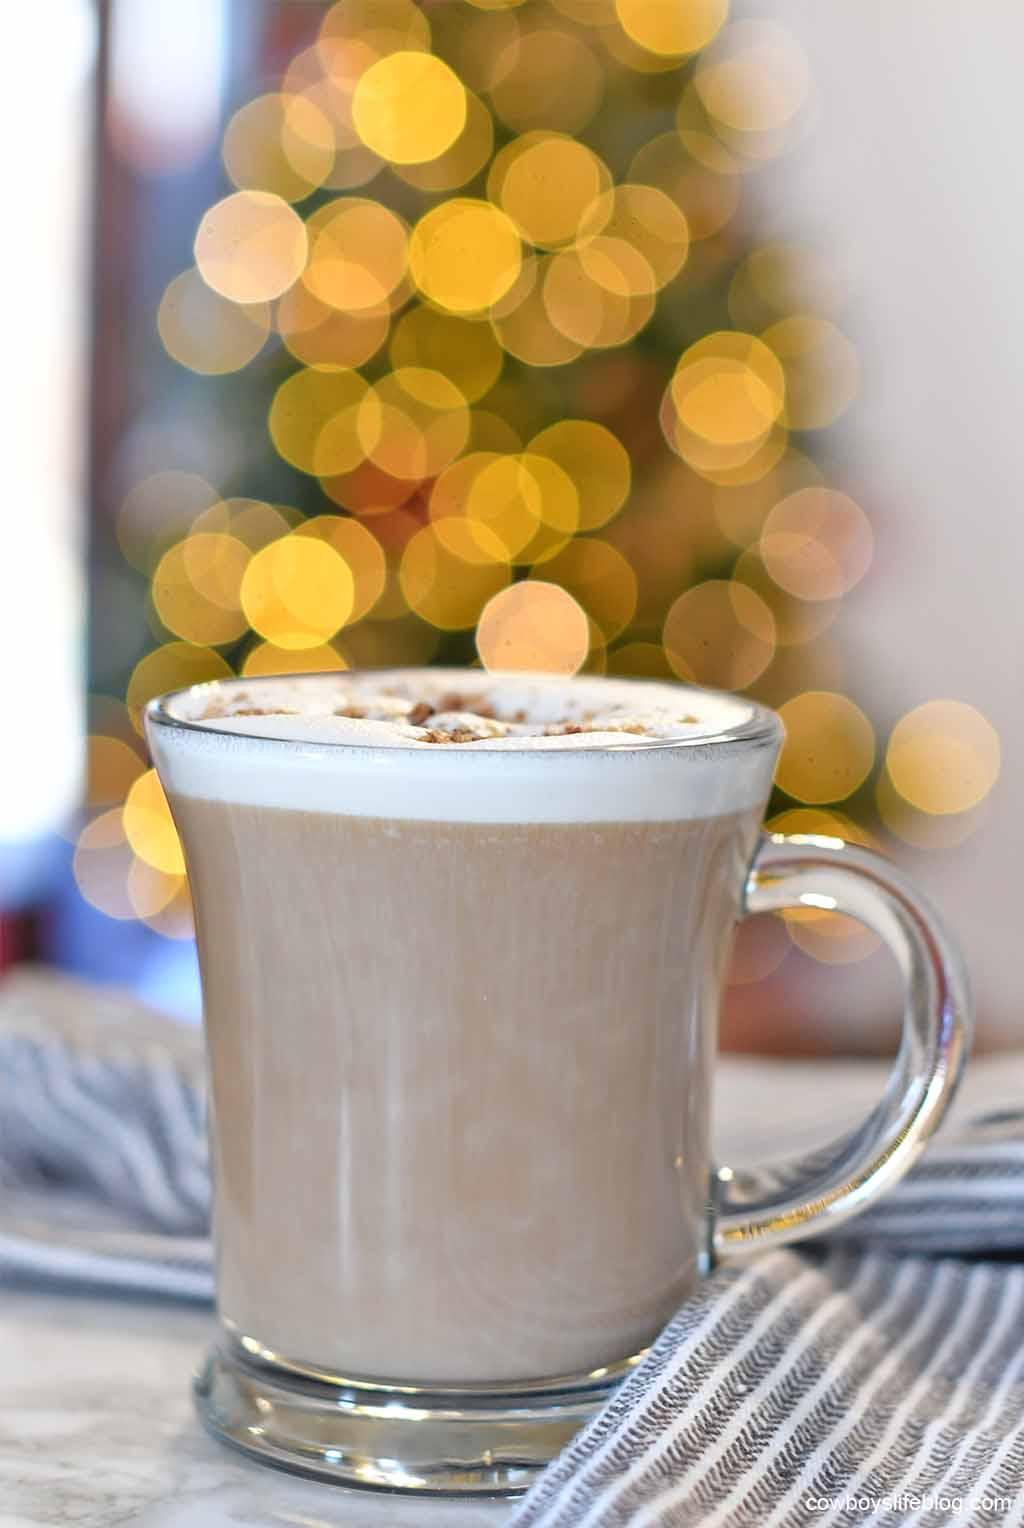 How to make Maple Pecan Latte